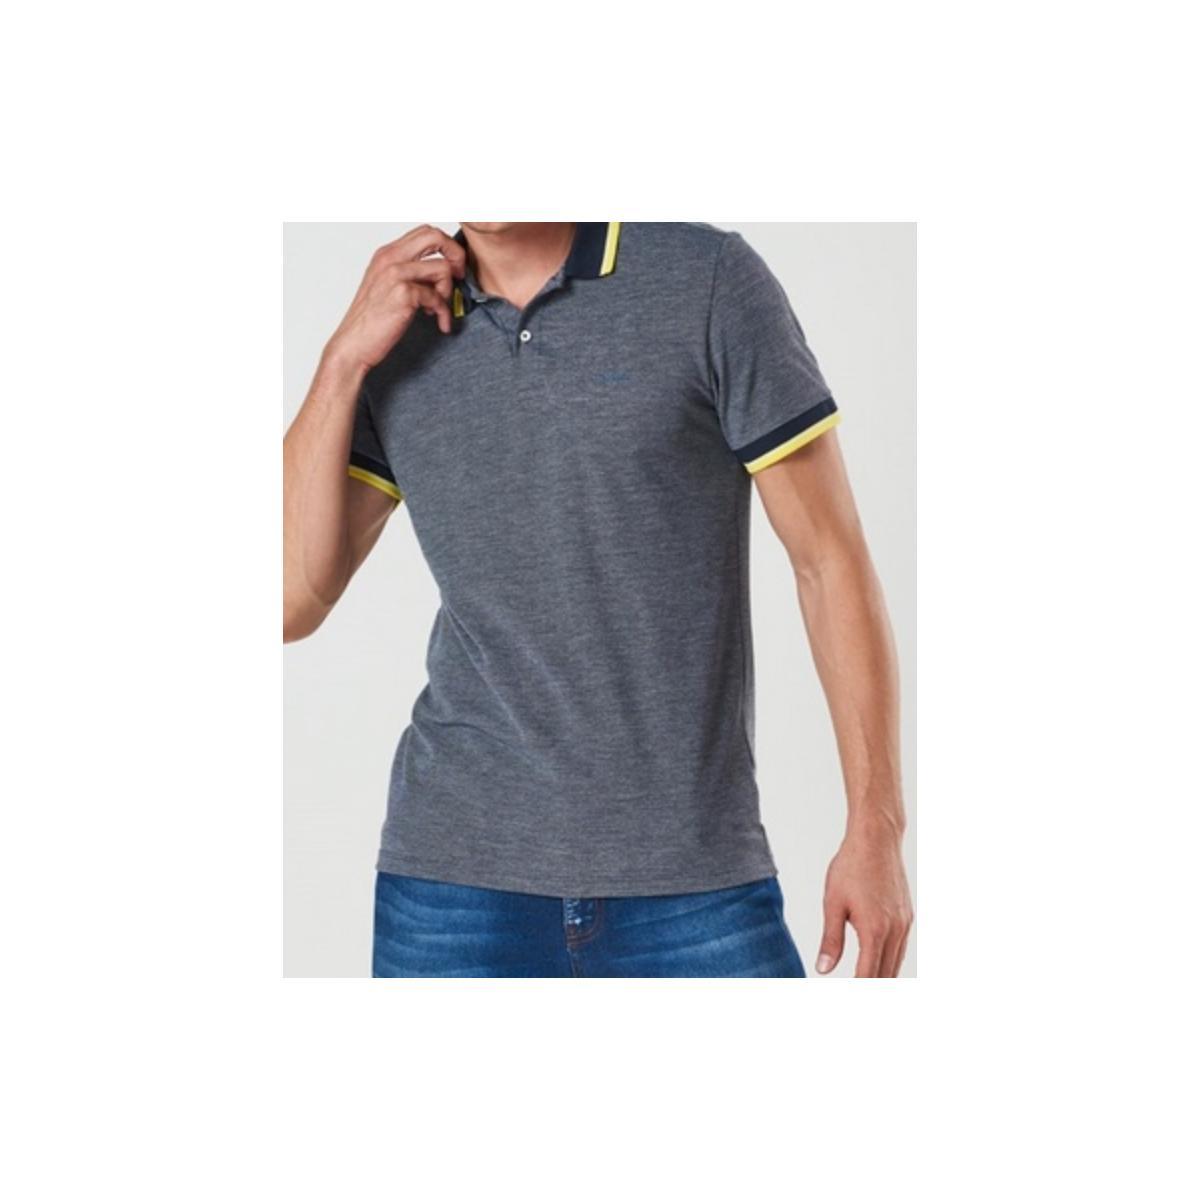 Camisa Masculina Colcci 250102196 33664 Marinho